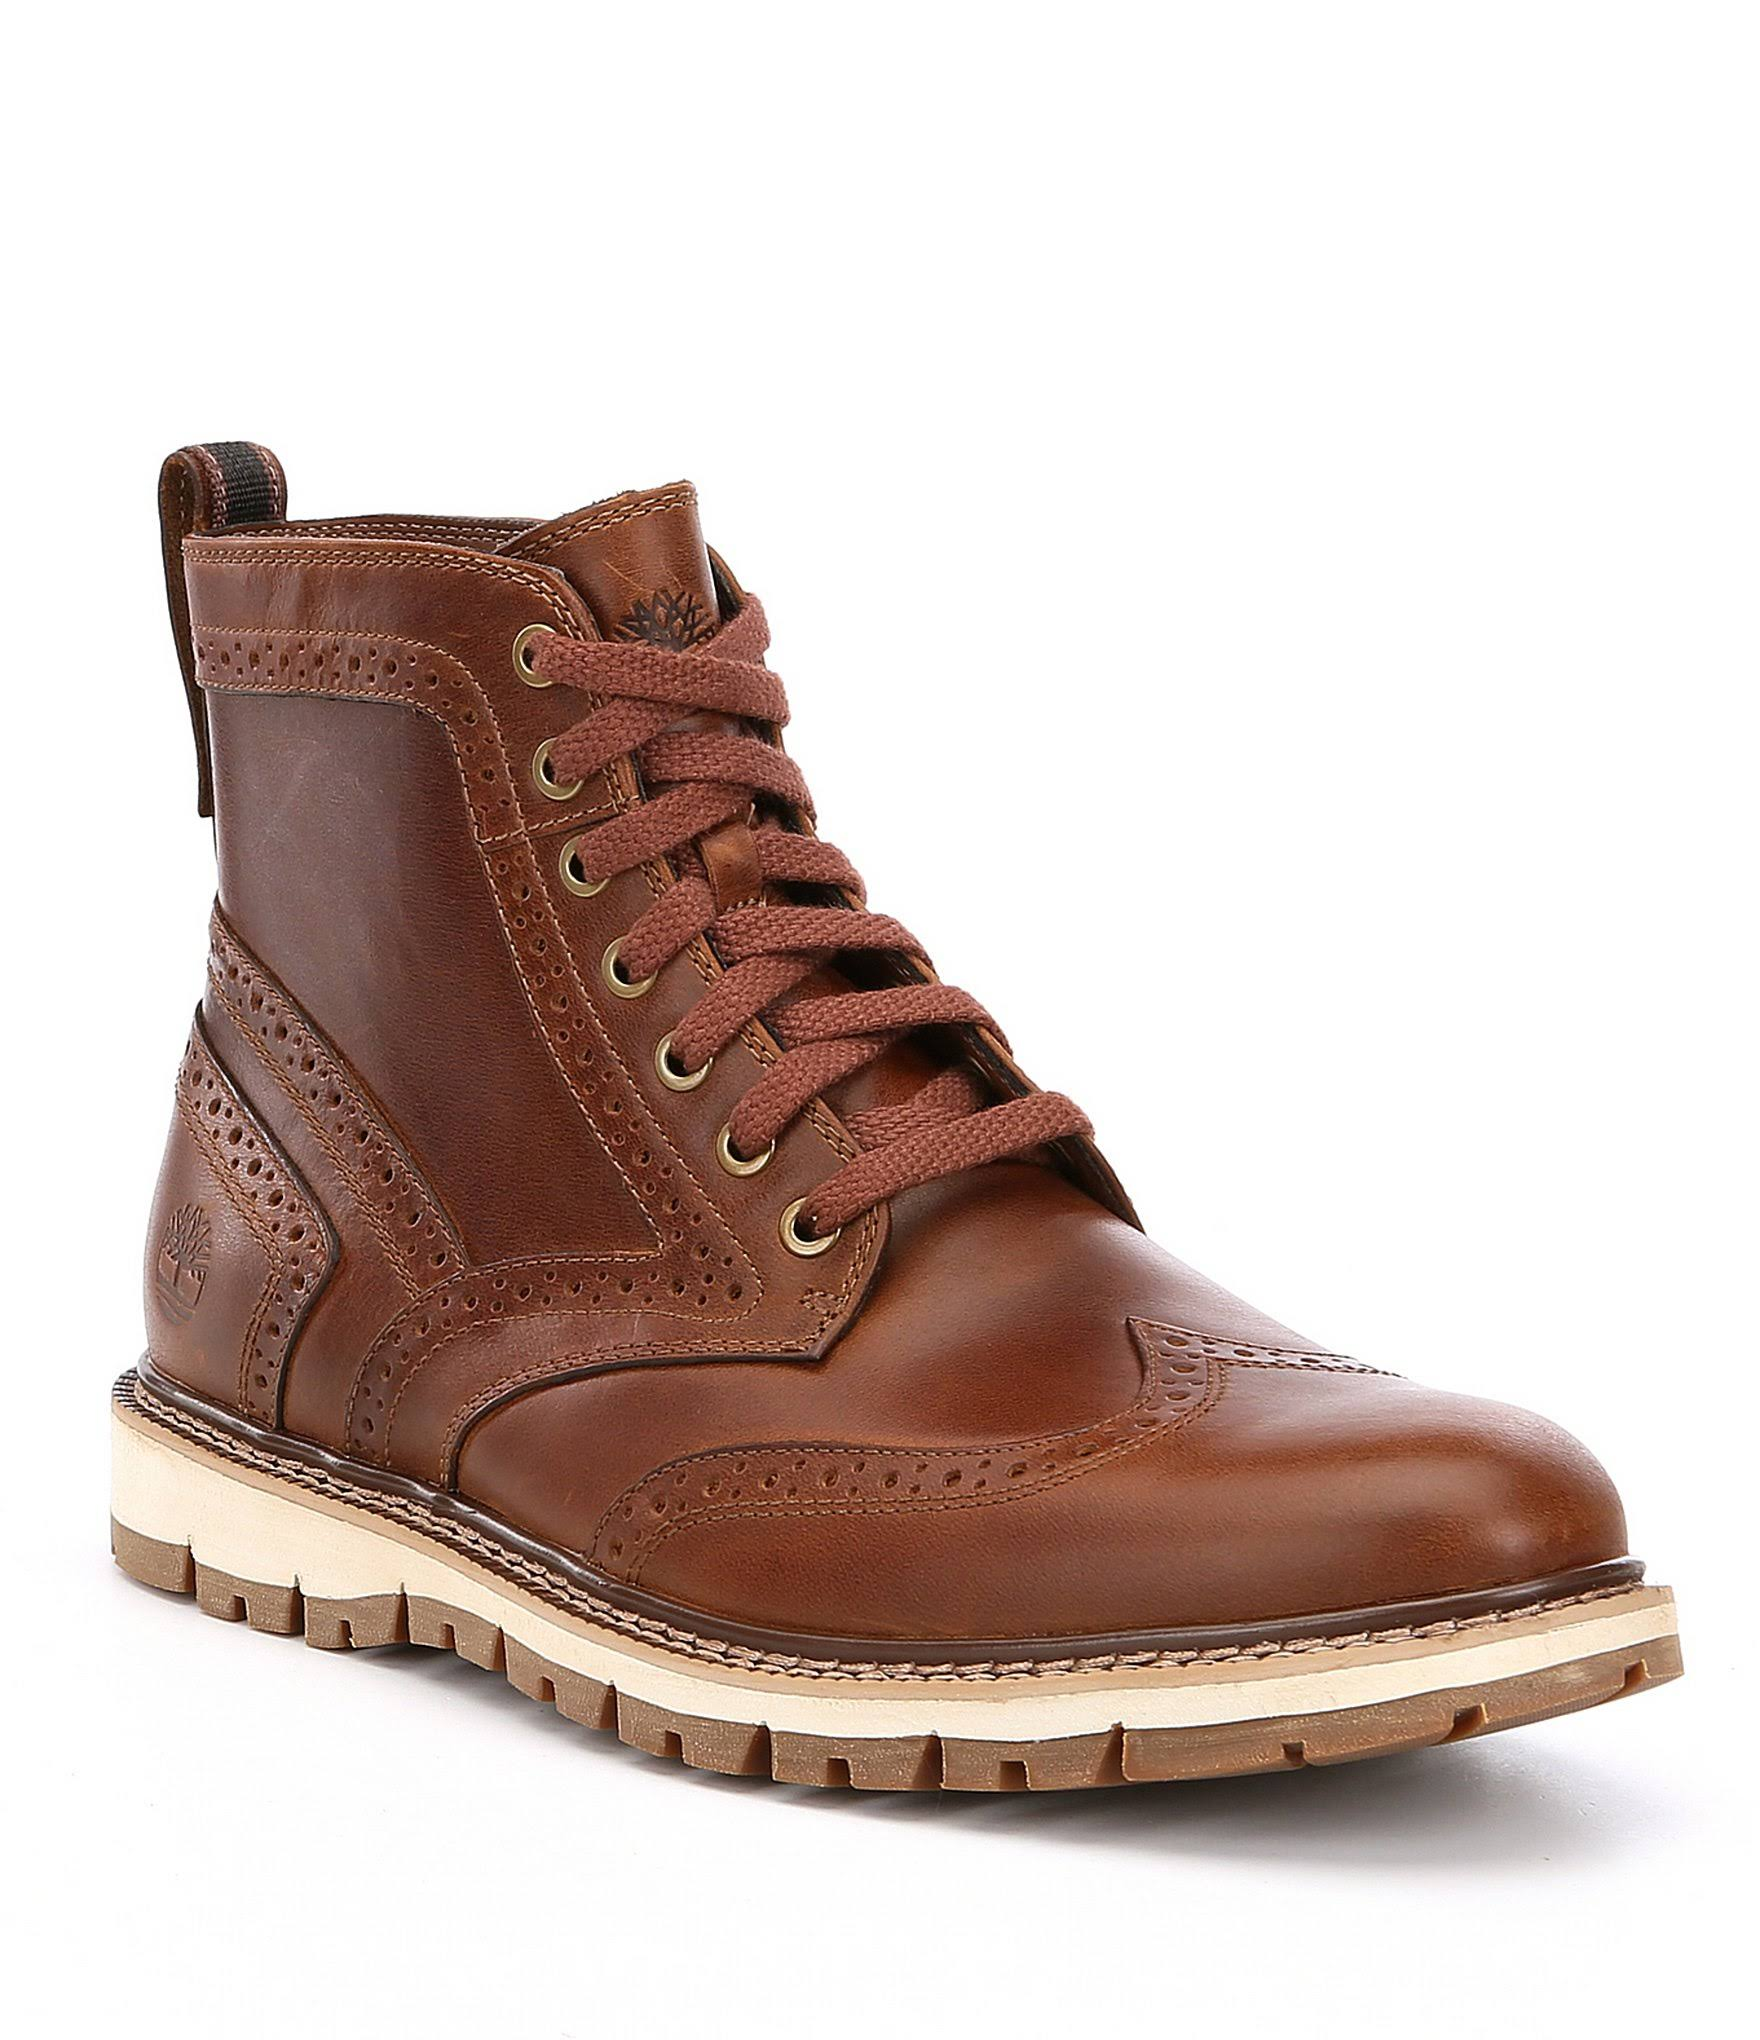 Britton Boot 5 Timberland Brogue MediumMarrone Hill Uomo 8 ZuTwPOXlki